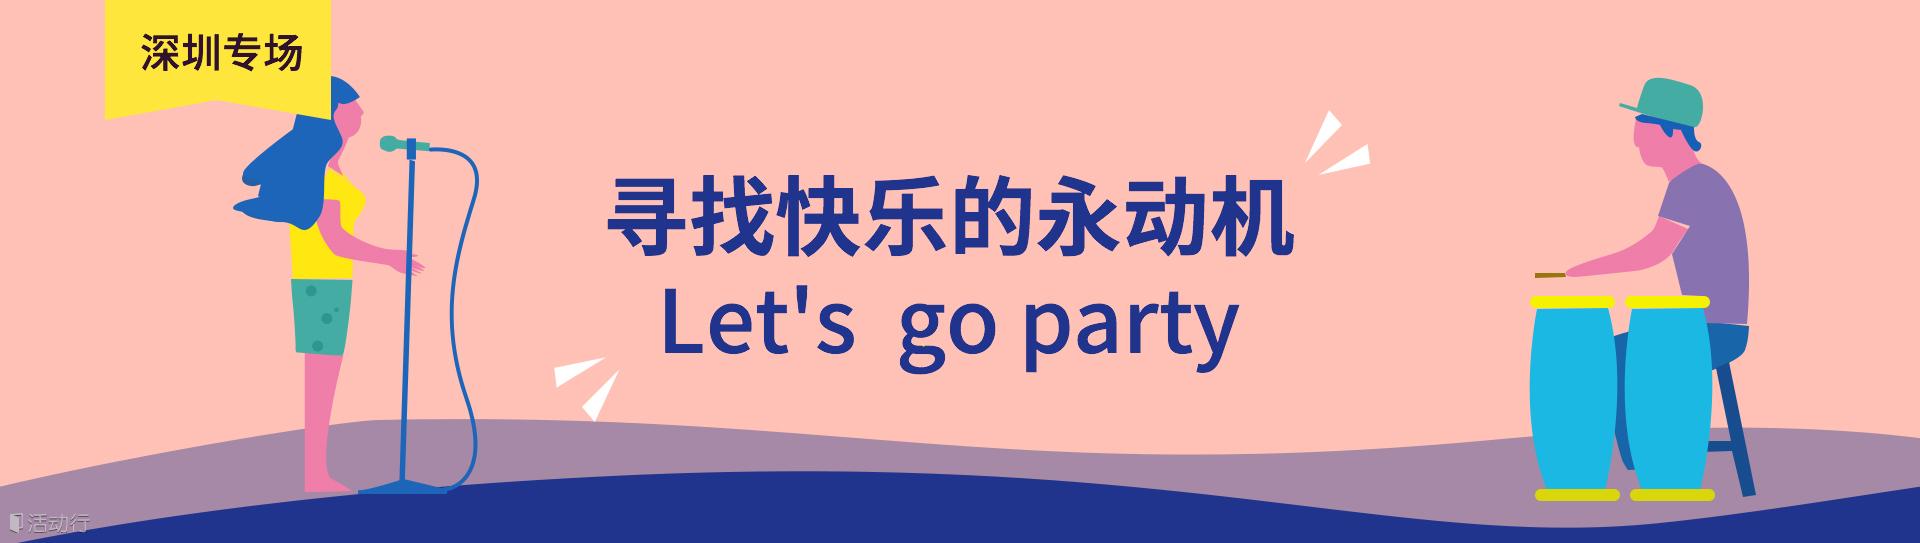 寻找快乐的永动机,let's go party